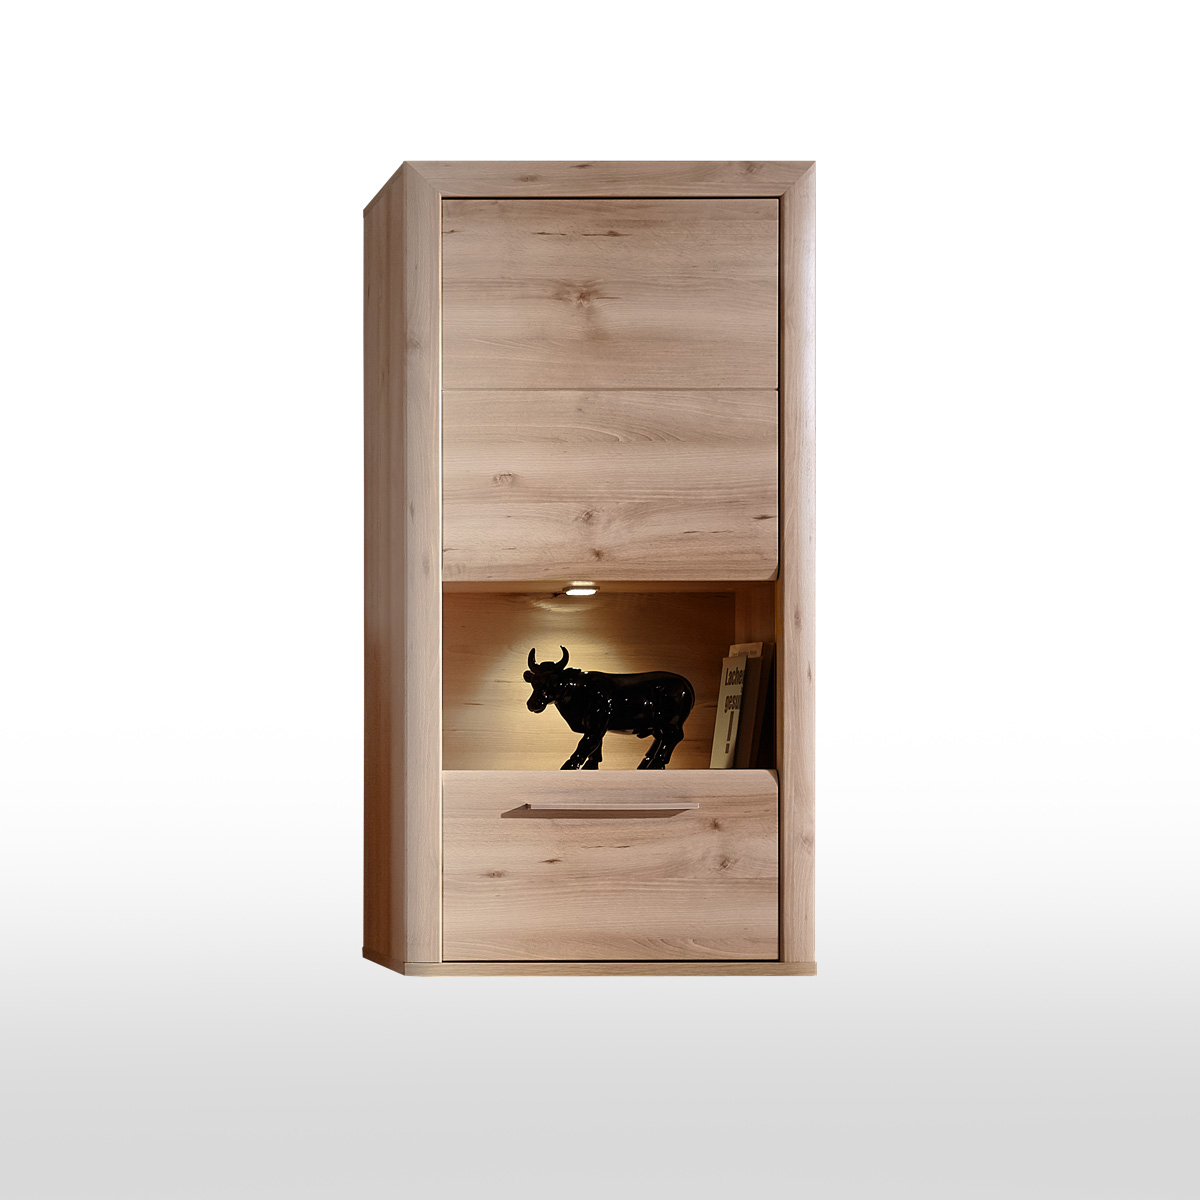 h ngevitrine run h ngeschrank h ngeelement vitrine schrank buche hell inkl led ebay. Black Bedroom Furniture Sets. Home Design Ideas